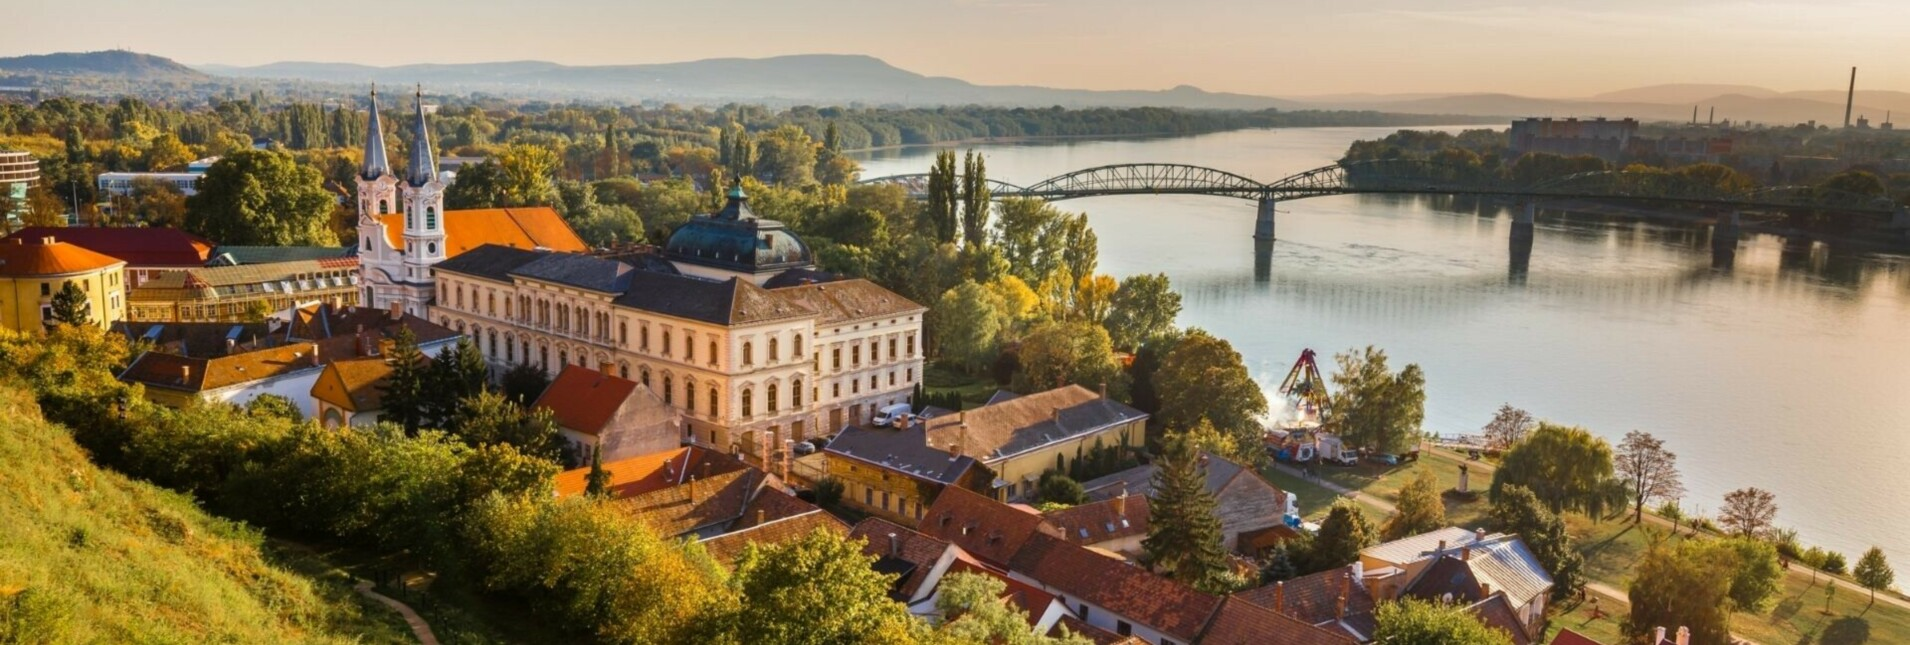 MS Primadonna - Kurzkreuzfahrt Wien - Budapest - Wien